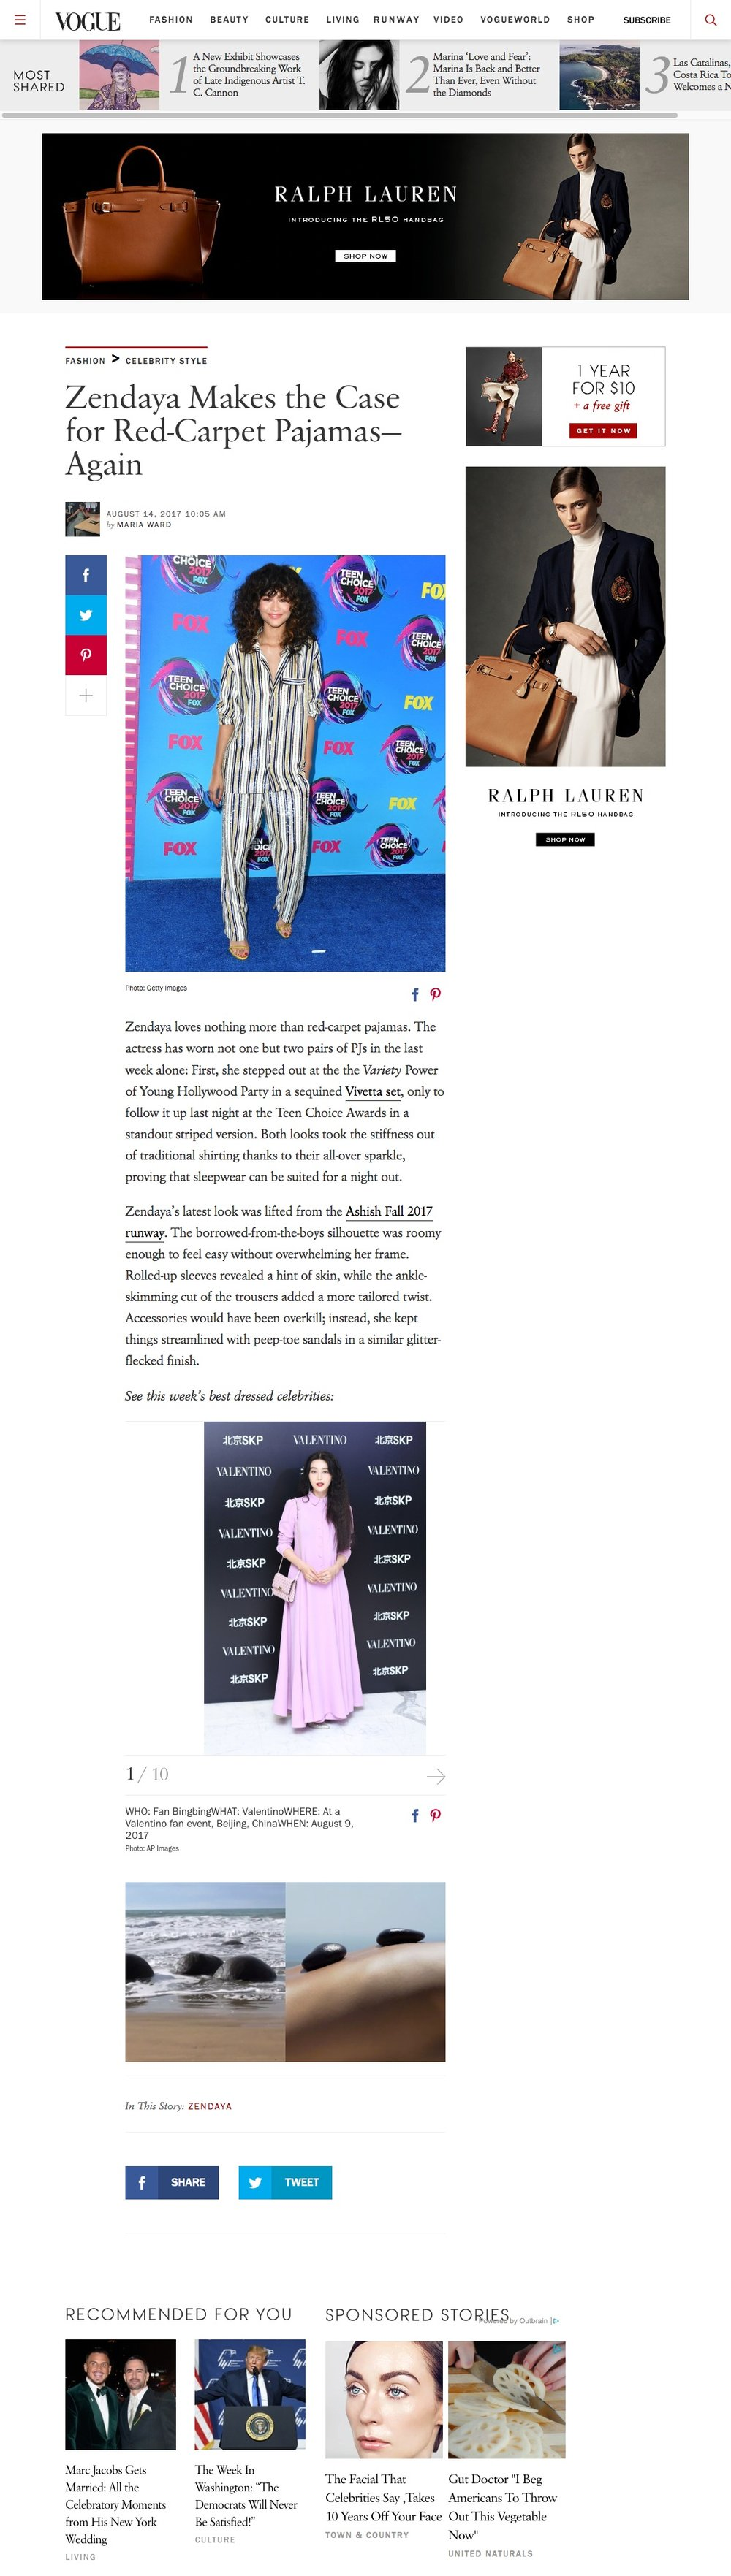 screencapture-vogue-article-zendaya-red-carpet-pajamas-trend-teen-choice-awards-celebrity-style-2019-04-07-10_12_53.jpg